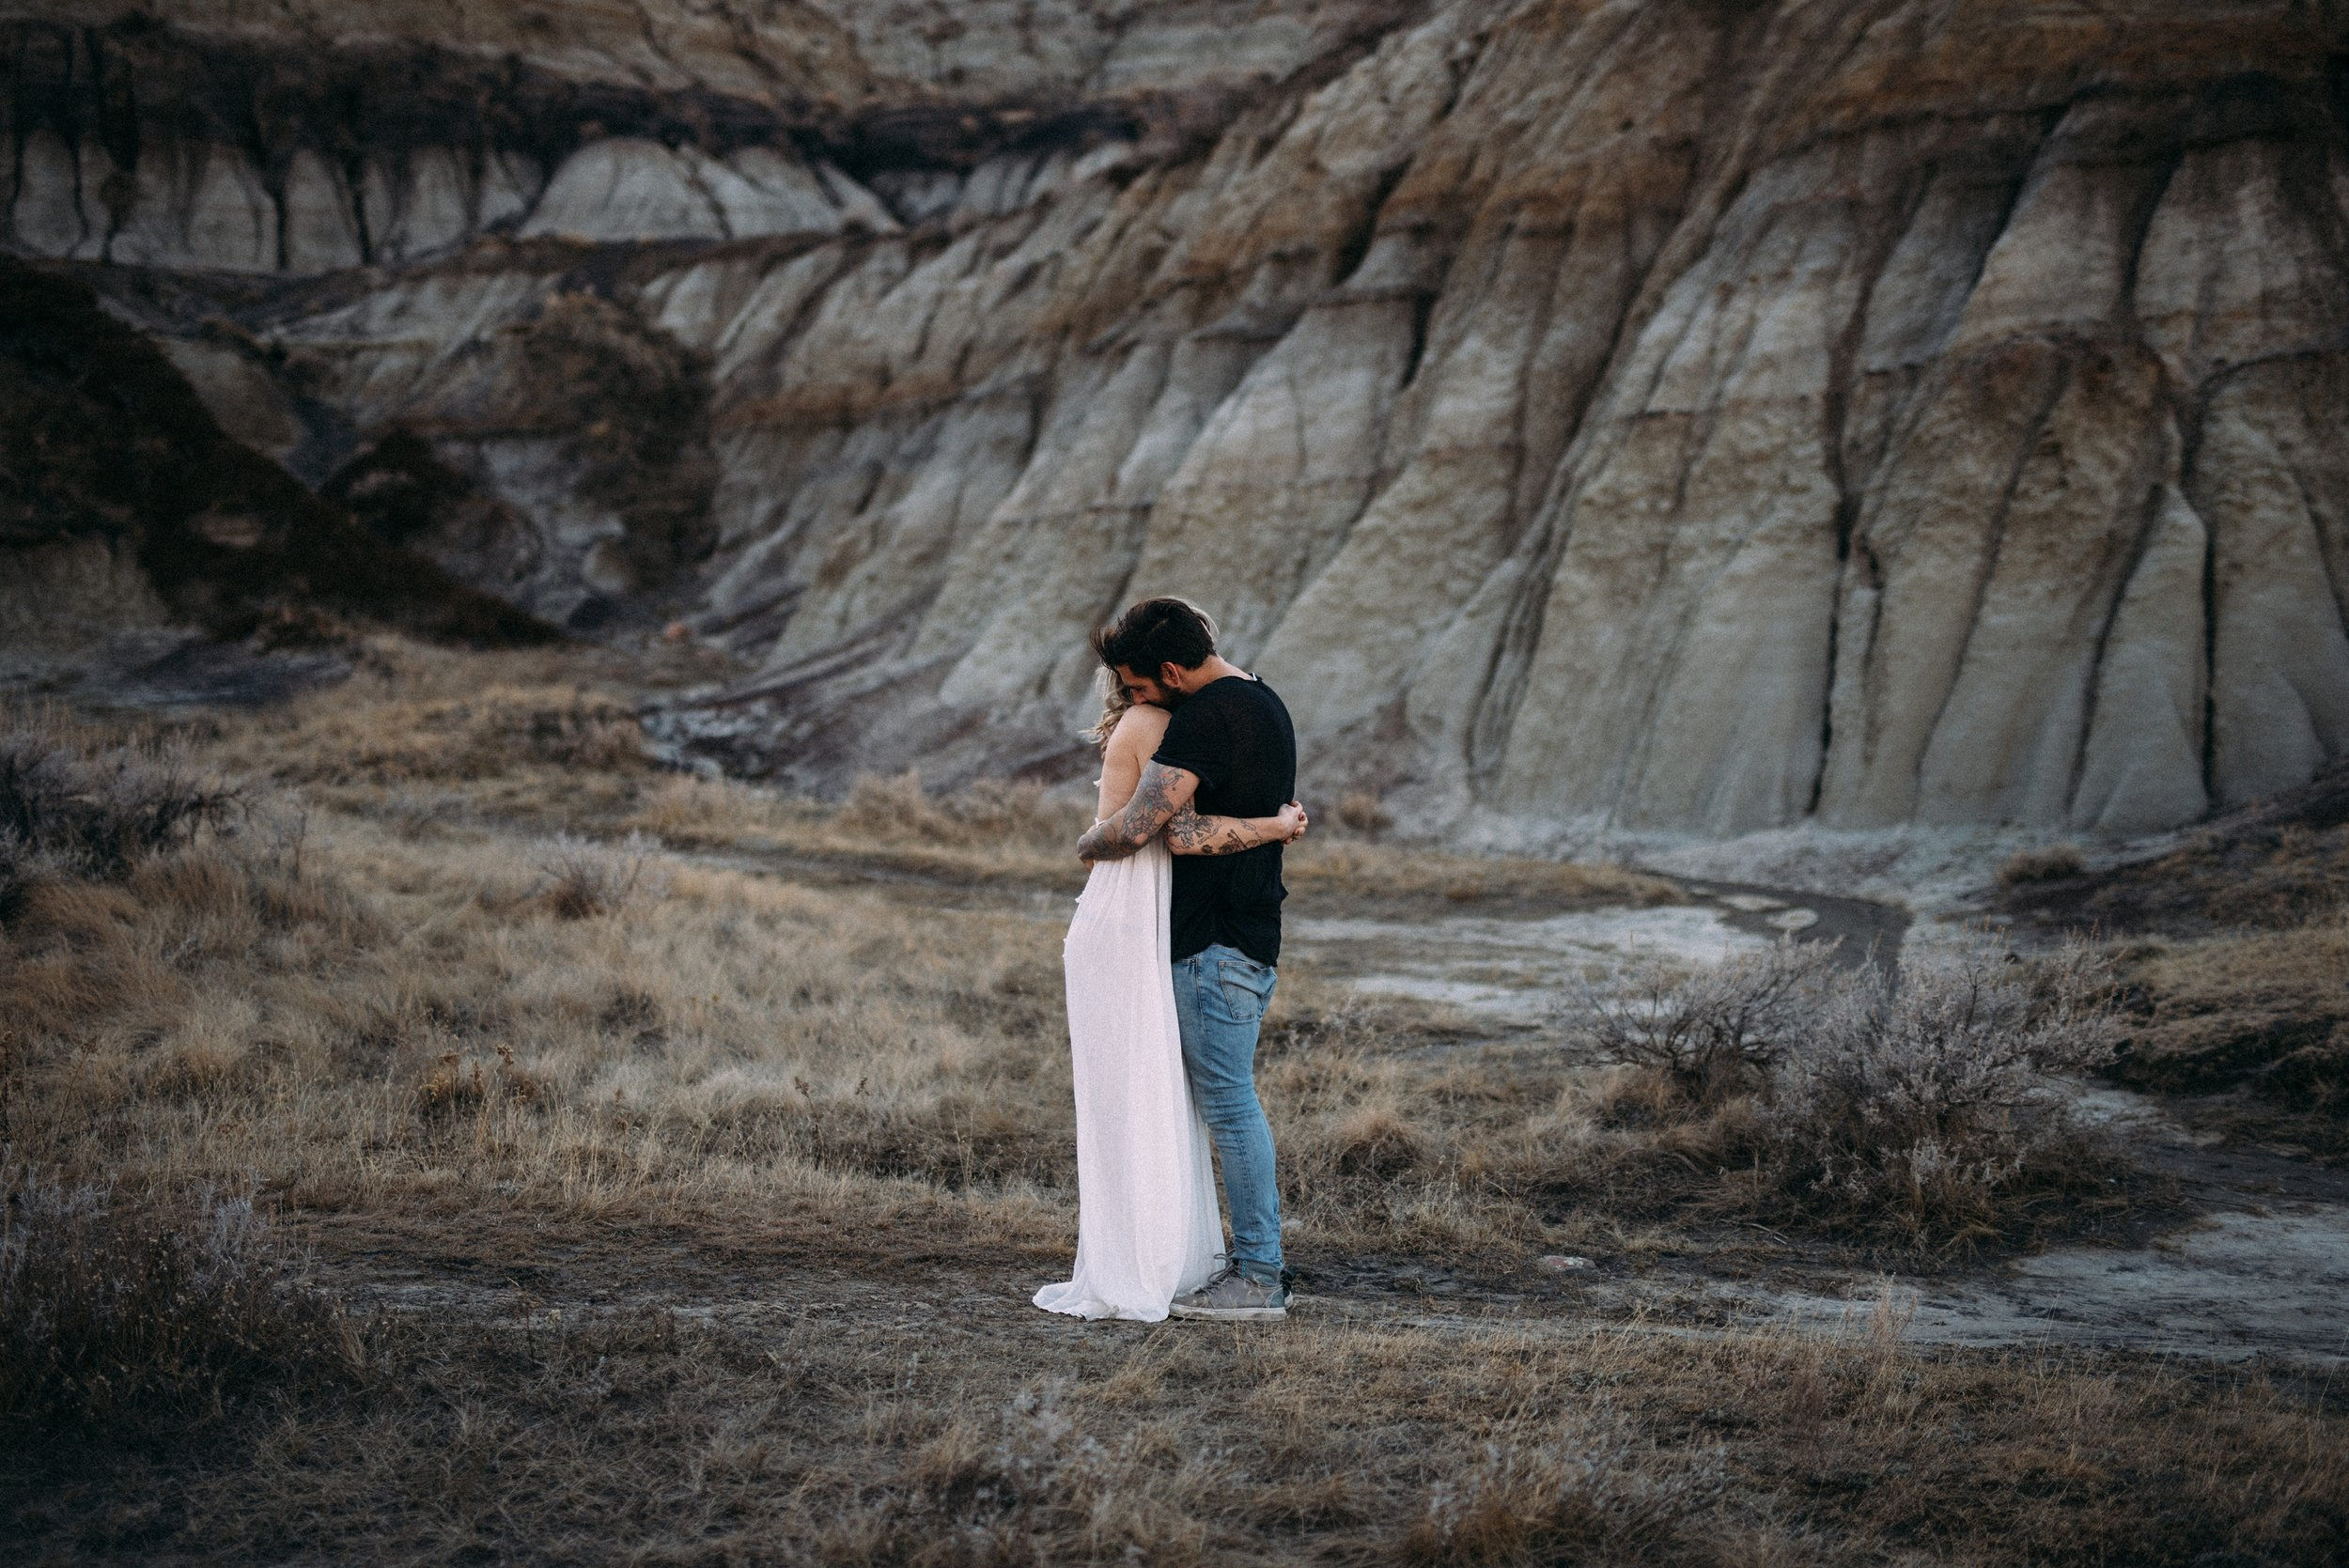 kaihla_tonai_intimate_wedding_elopement_photographer_3576